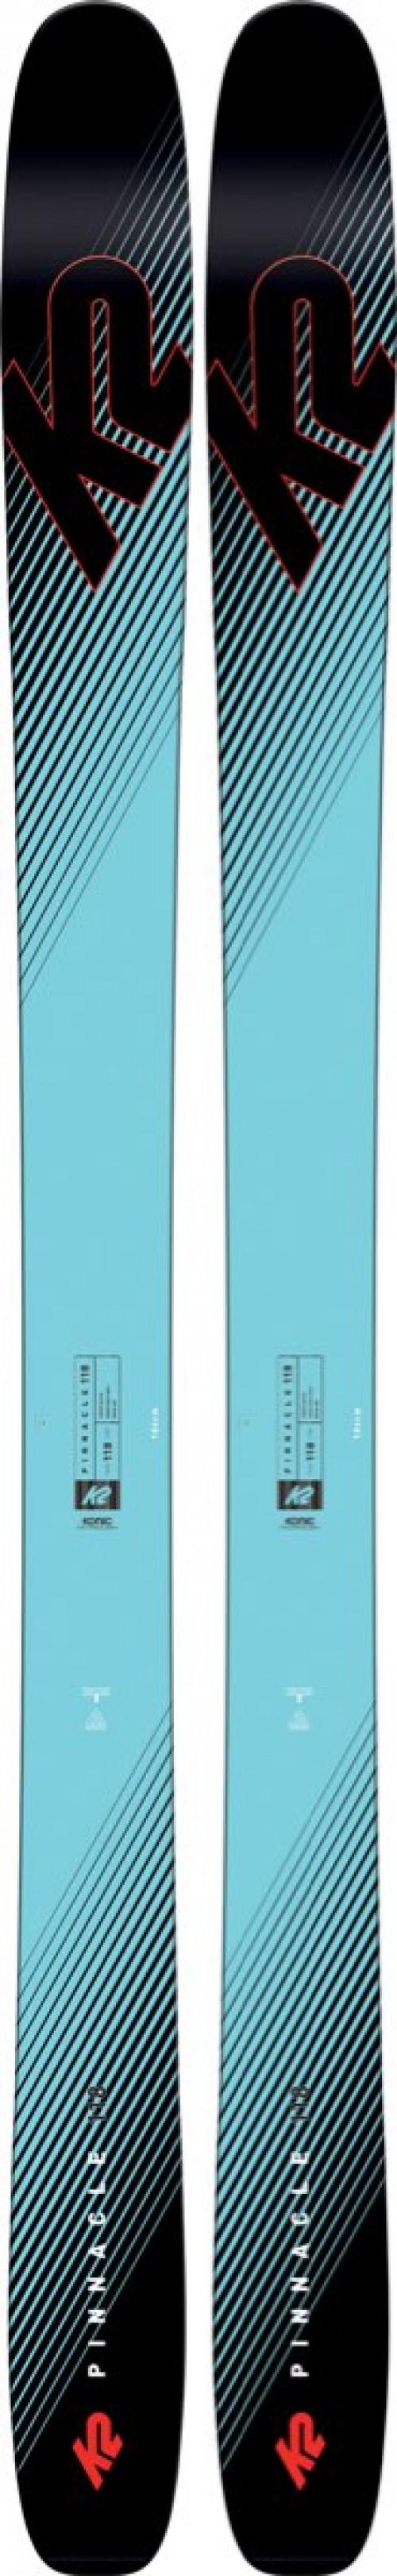 K2 Skis Pinnacle 118 Blå/Svart